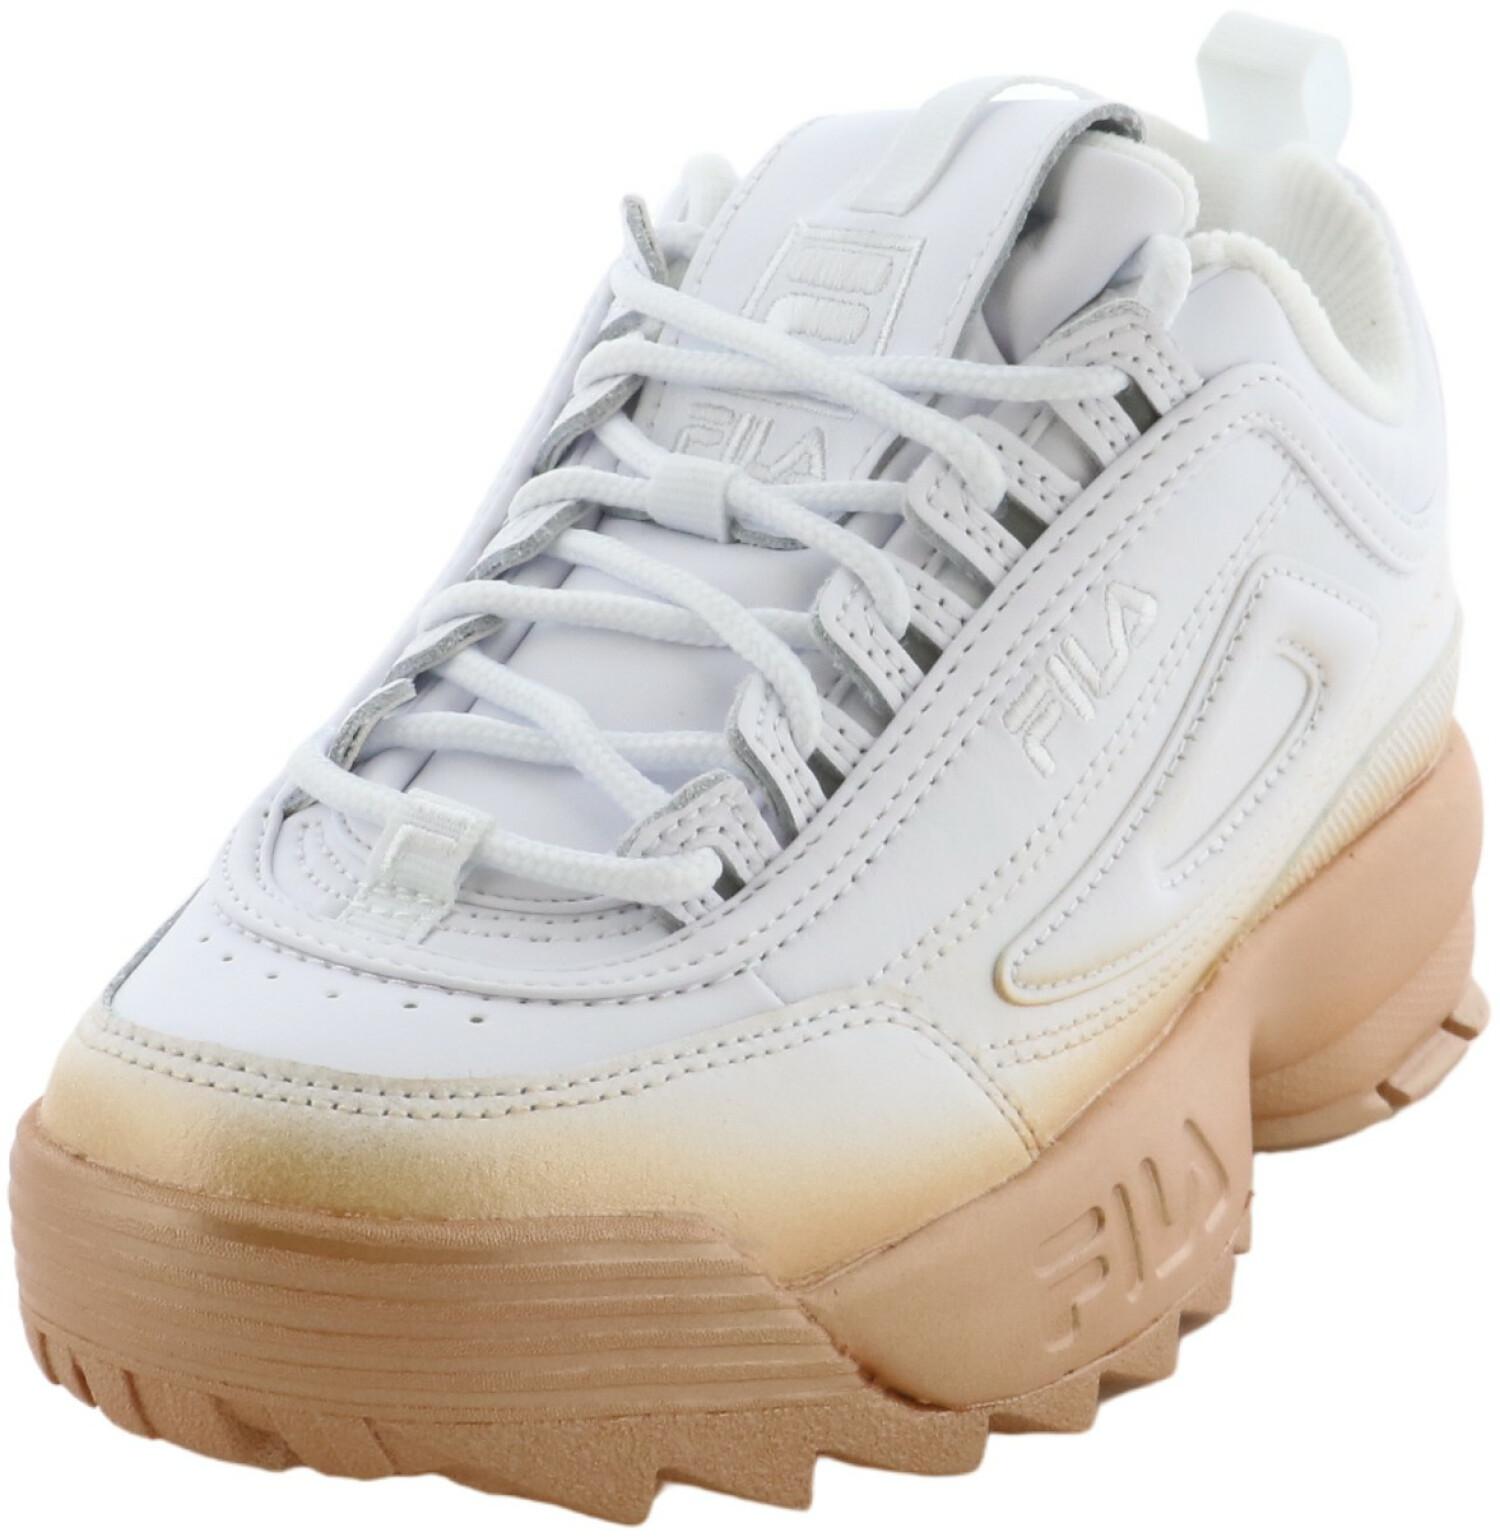 Fila Women's Disuptor Ii Brights Fade White / Rose Gold Ankle-High Sneaker - 5M